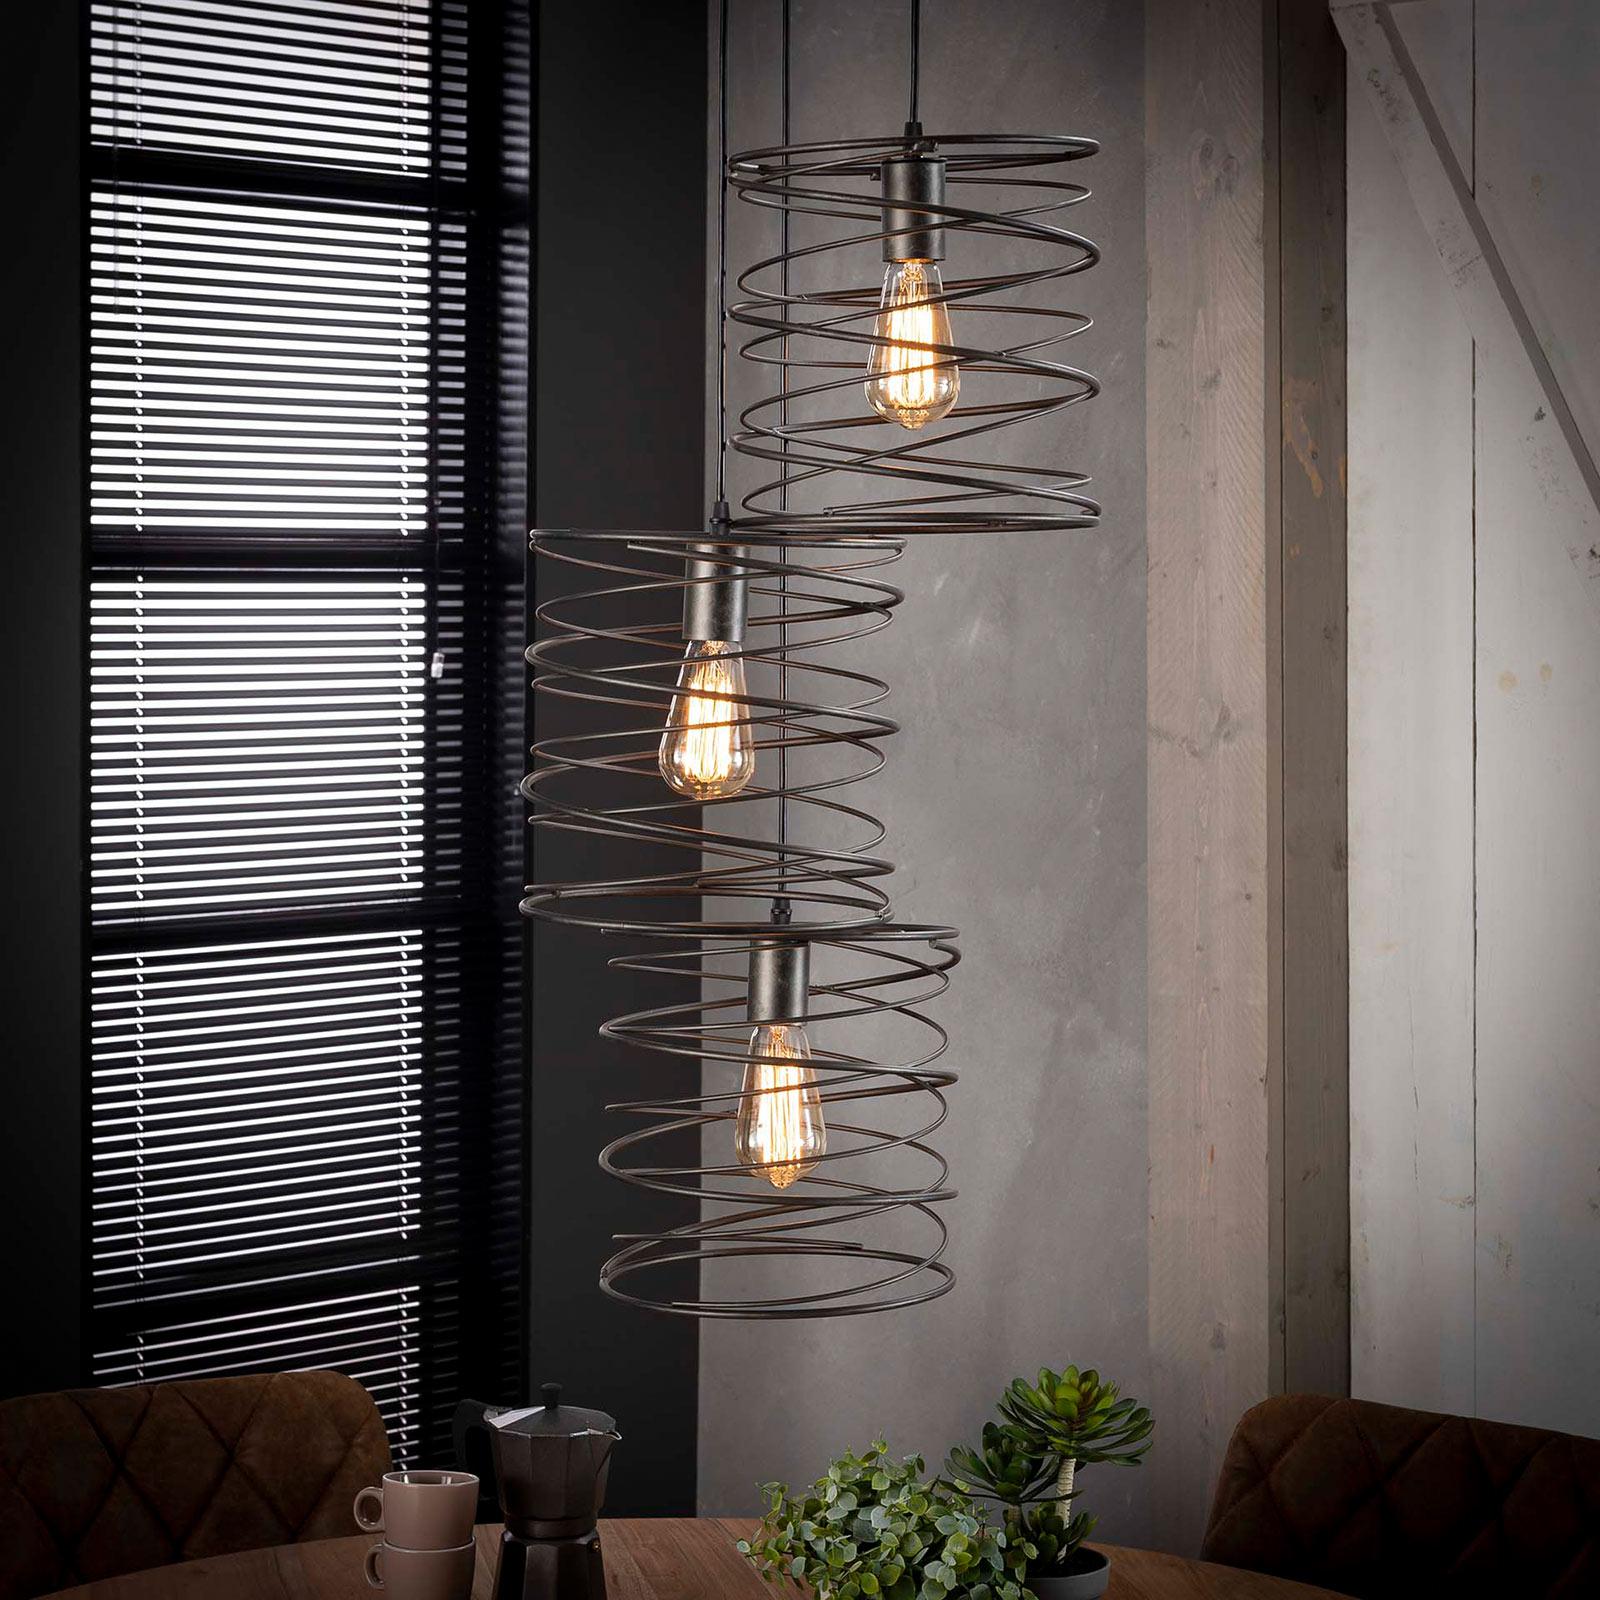 Lampa wisząca Swirlaronda, 3-punktowa